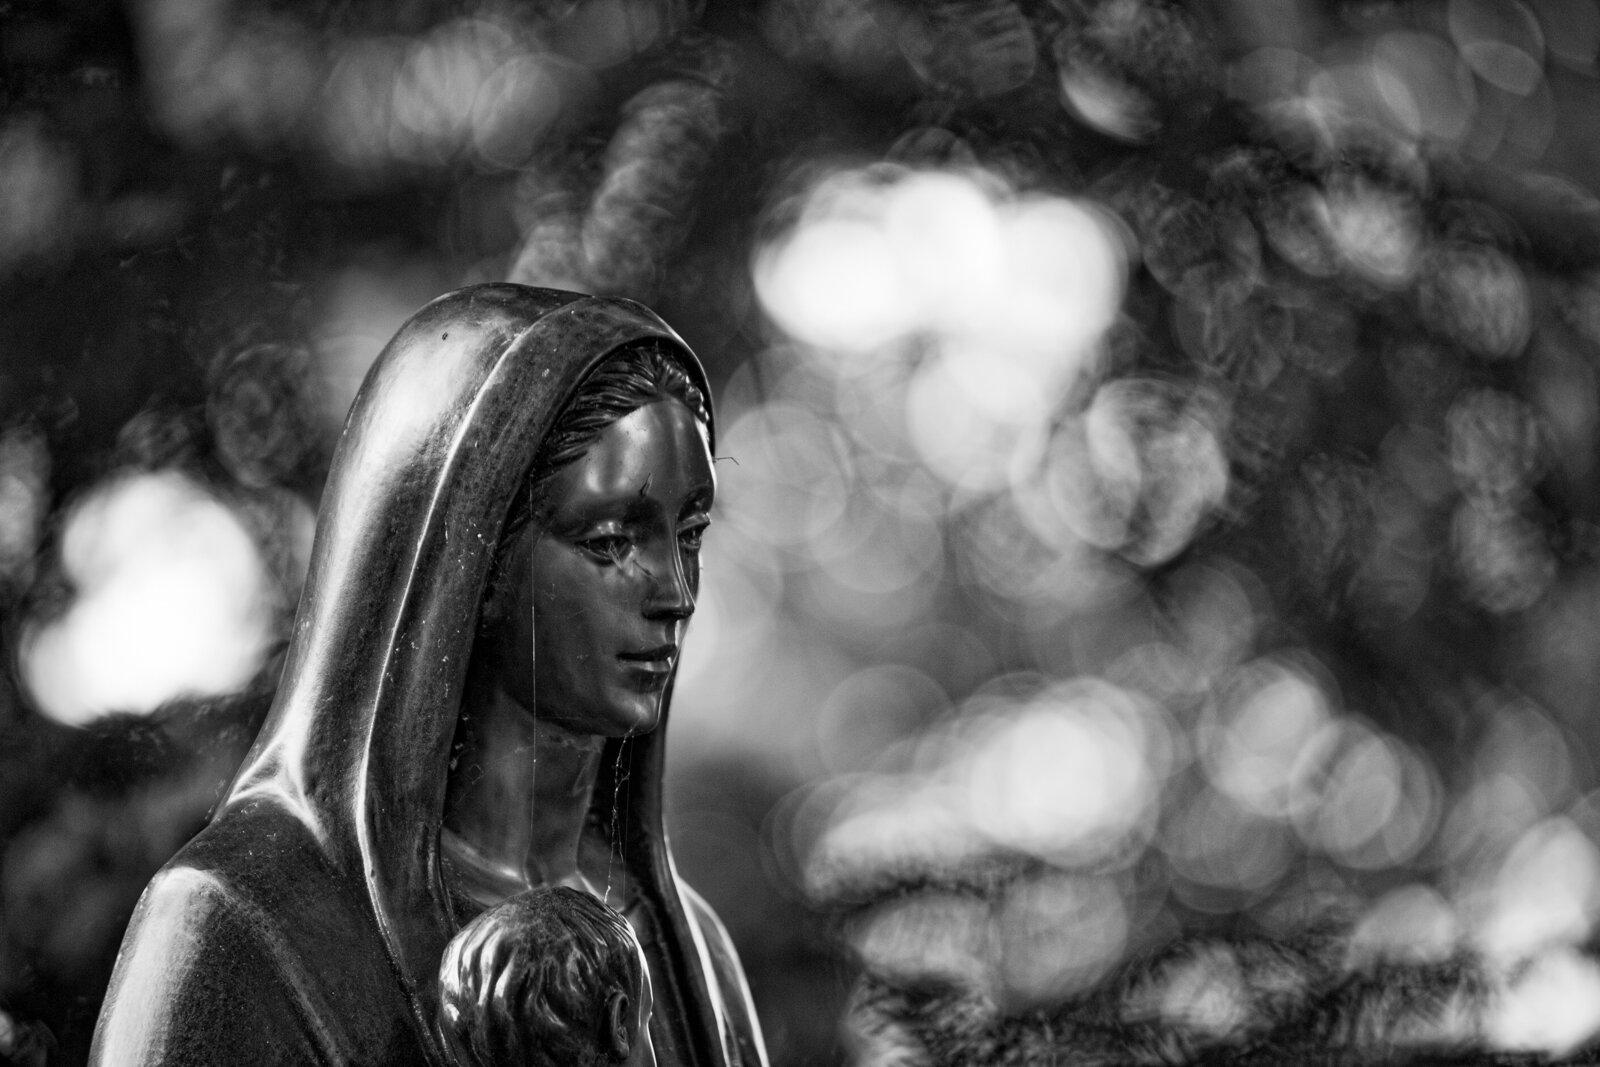 04__D7C0421_2014_05Friedhof-Edit____Friedhof-KA.jpg